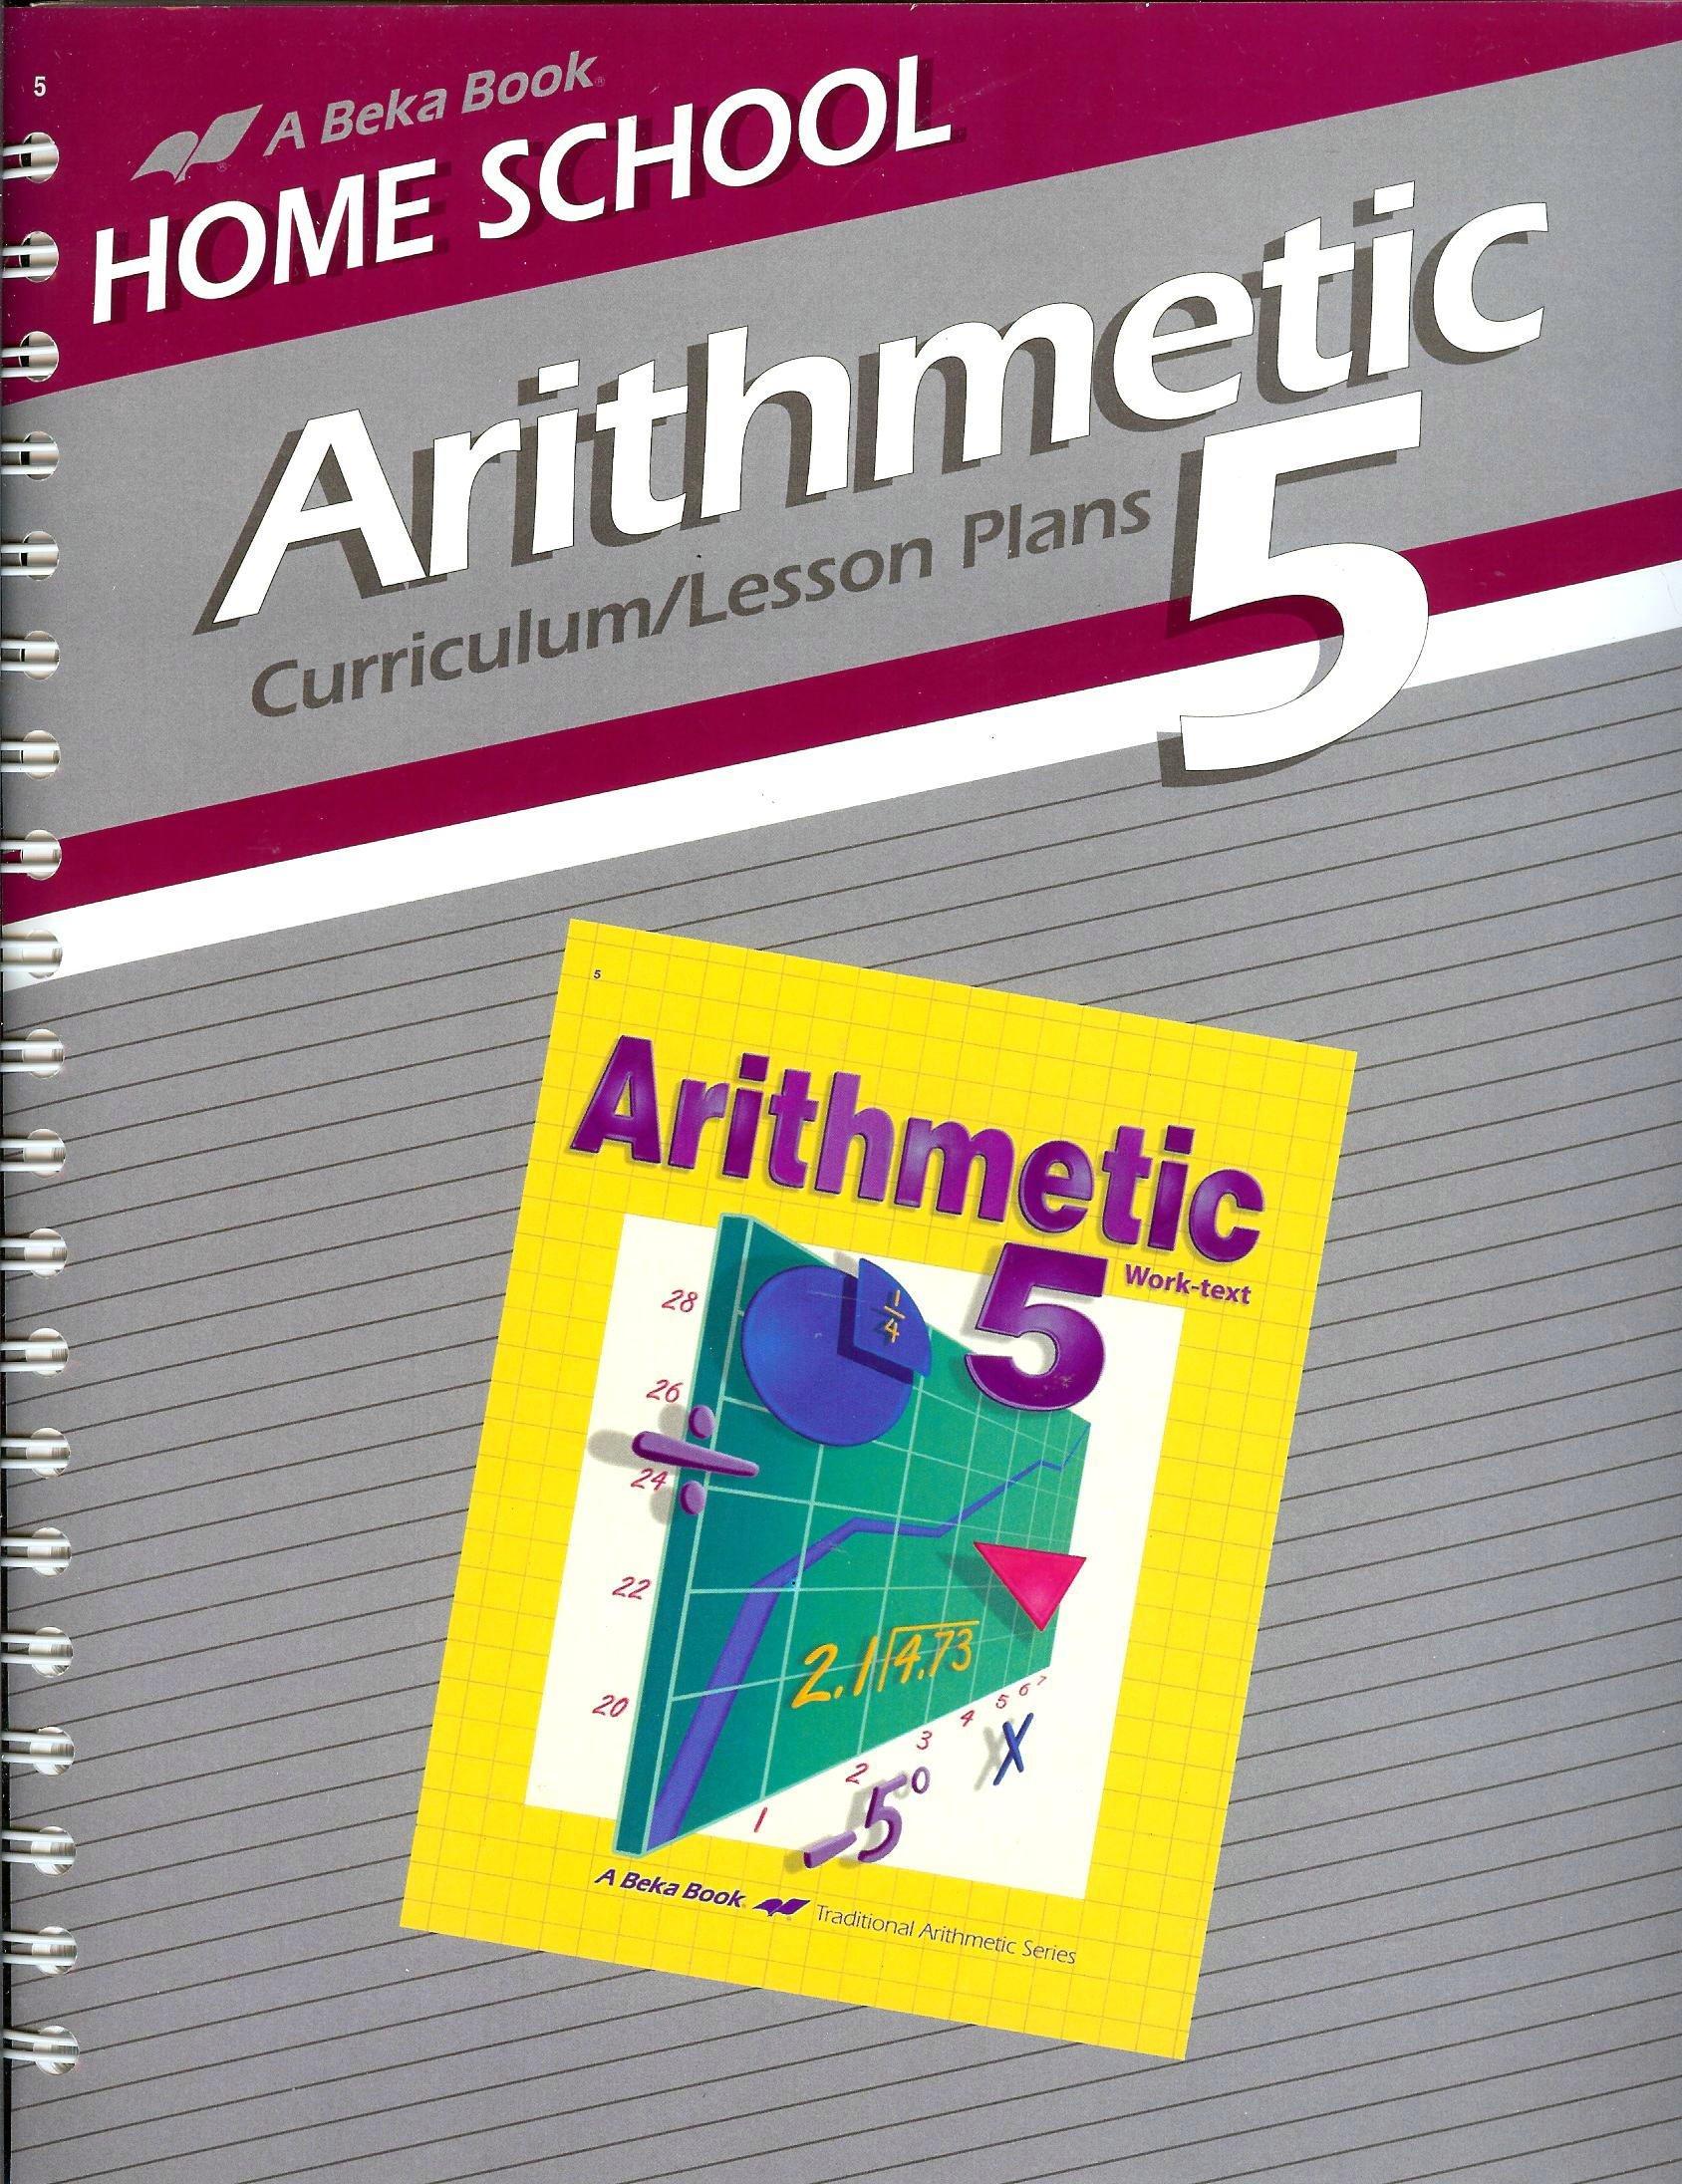 Download A Beka Book Home School Arithmetic 5 Curriculum/Lesson Plans ebook